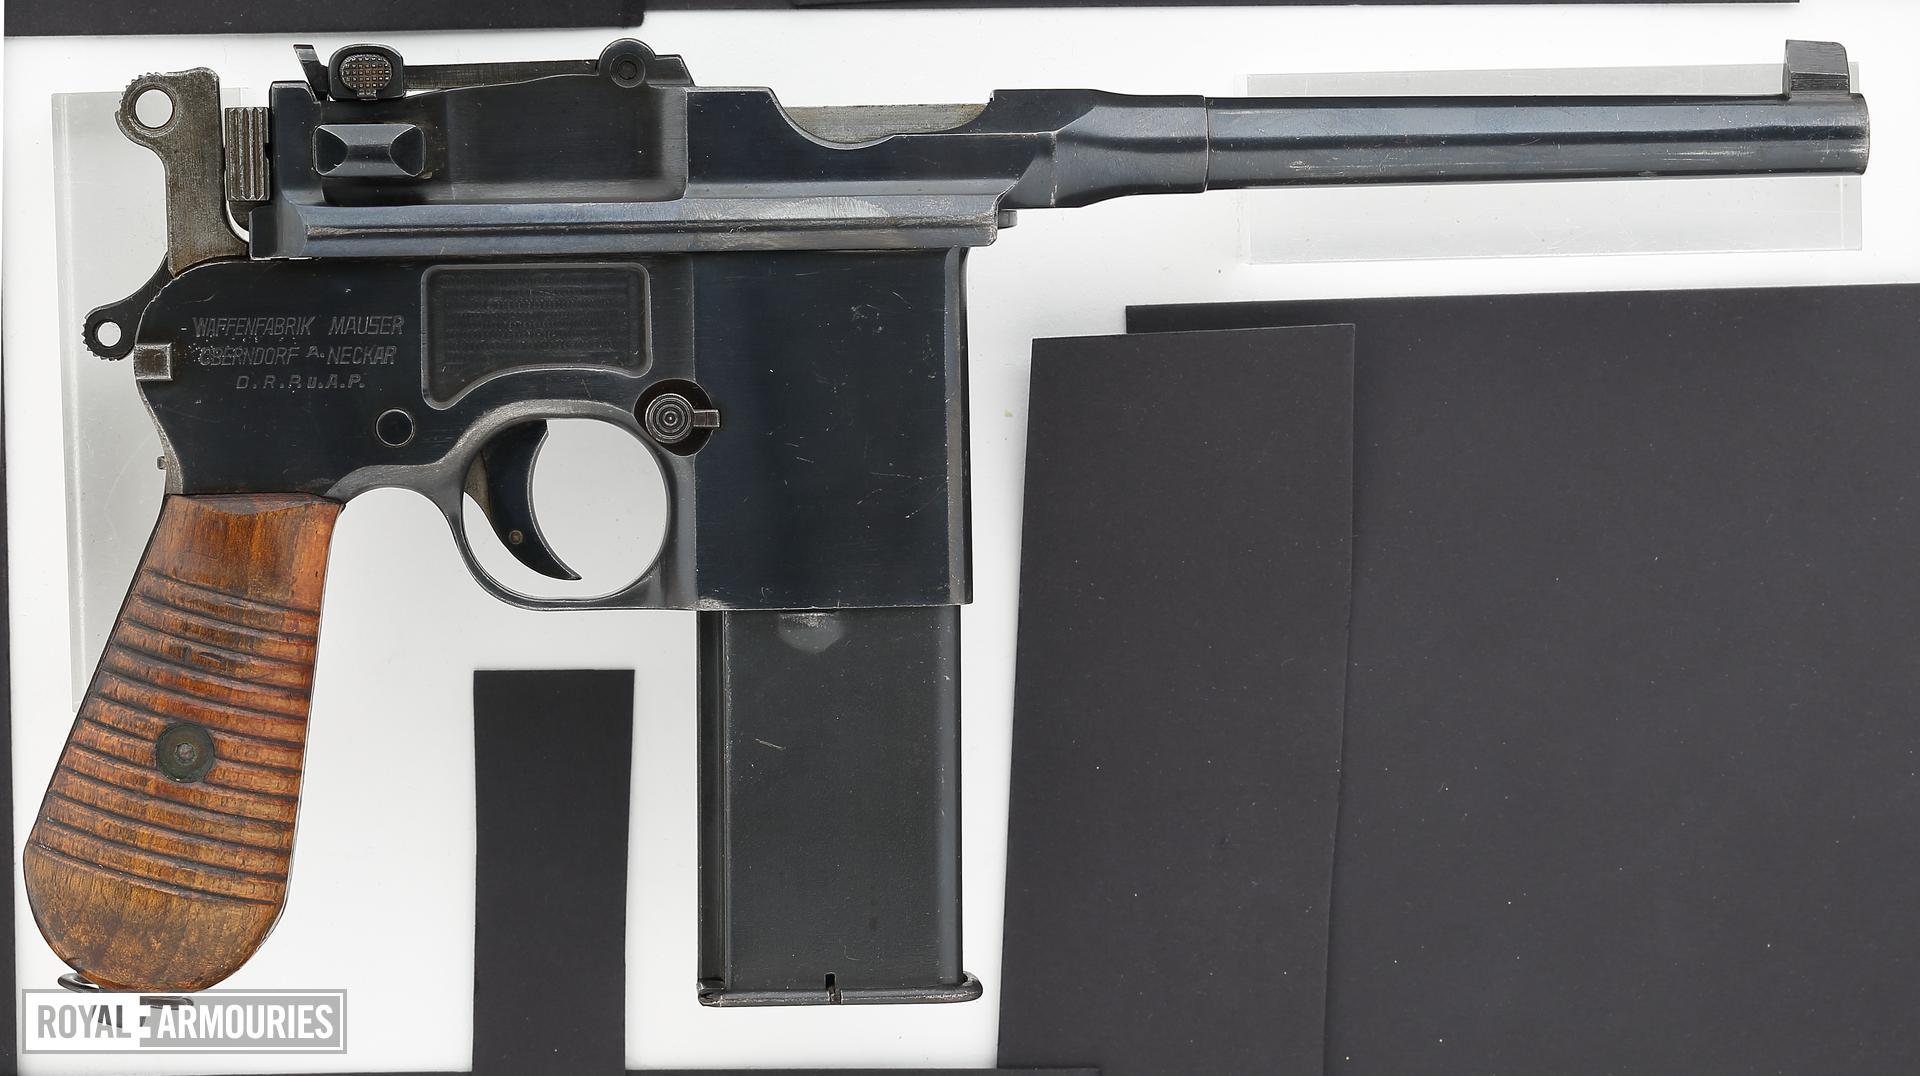 Centrefire automatic pistol - Mauser C96 Model 712 Schnellfeuer